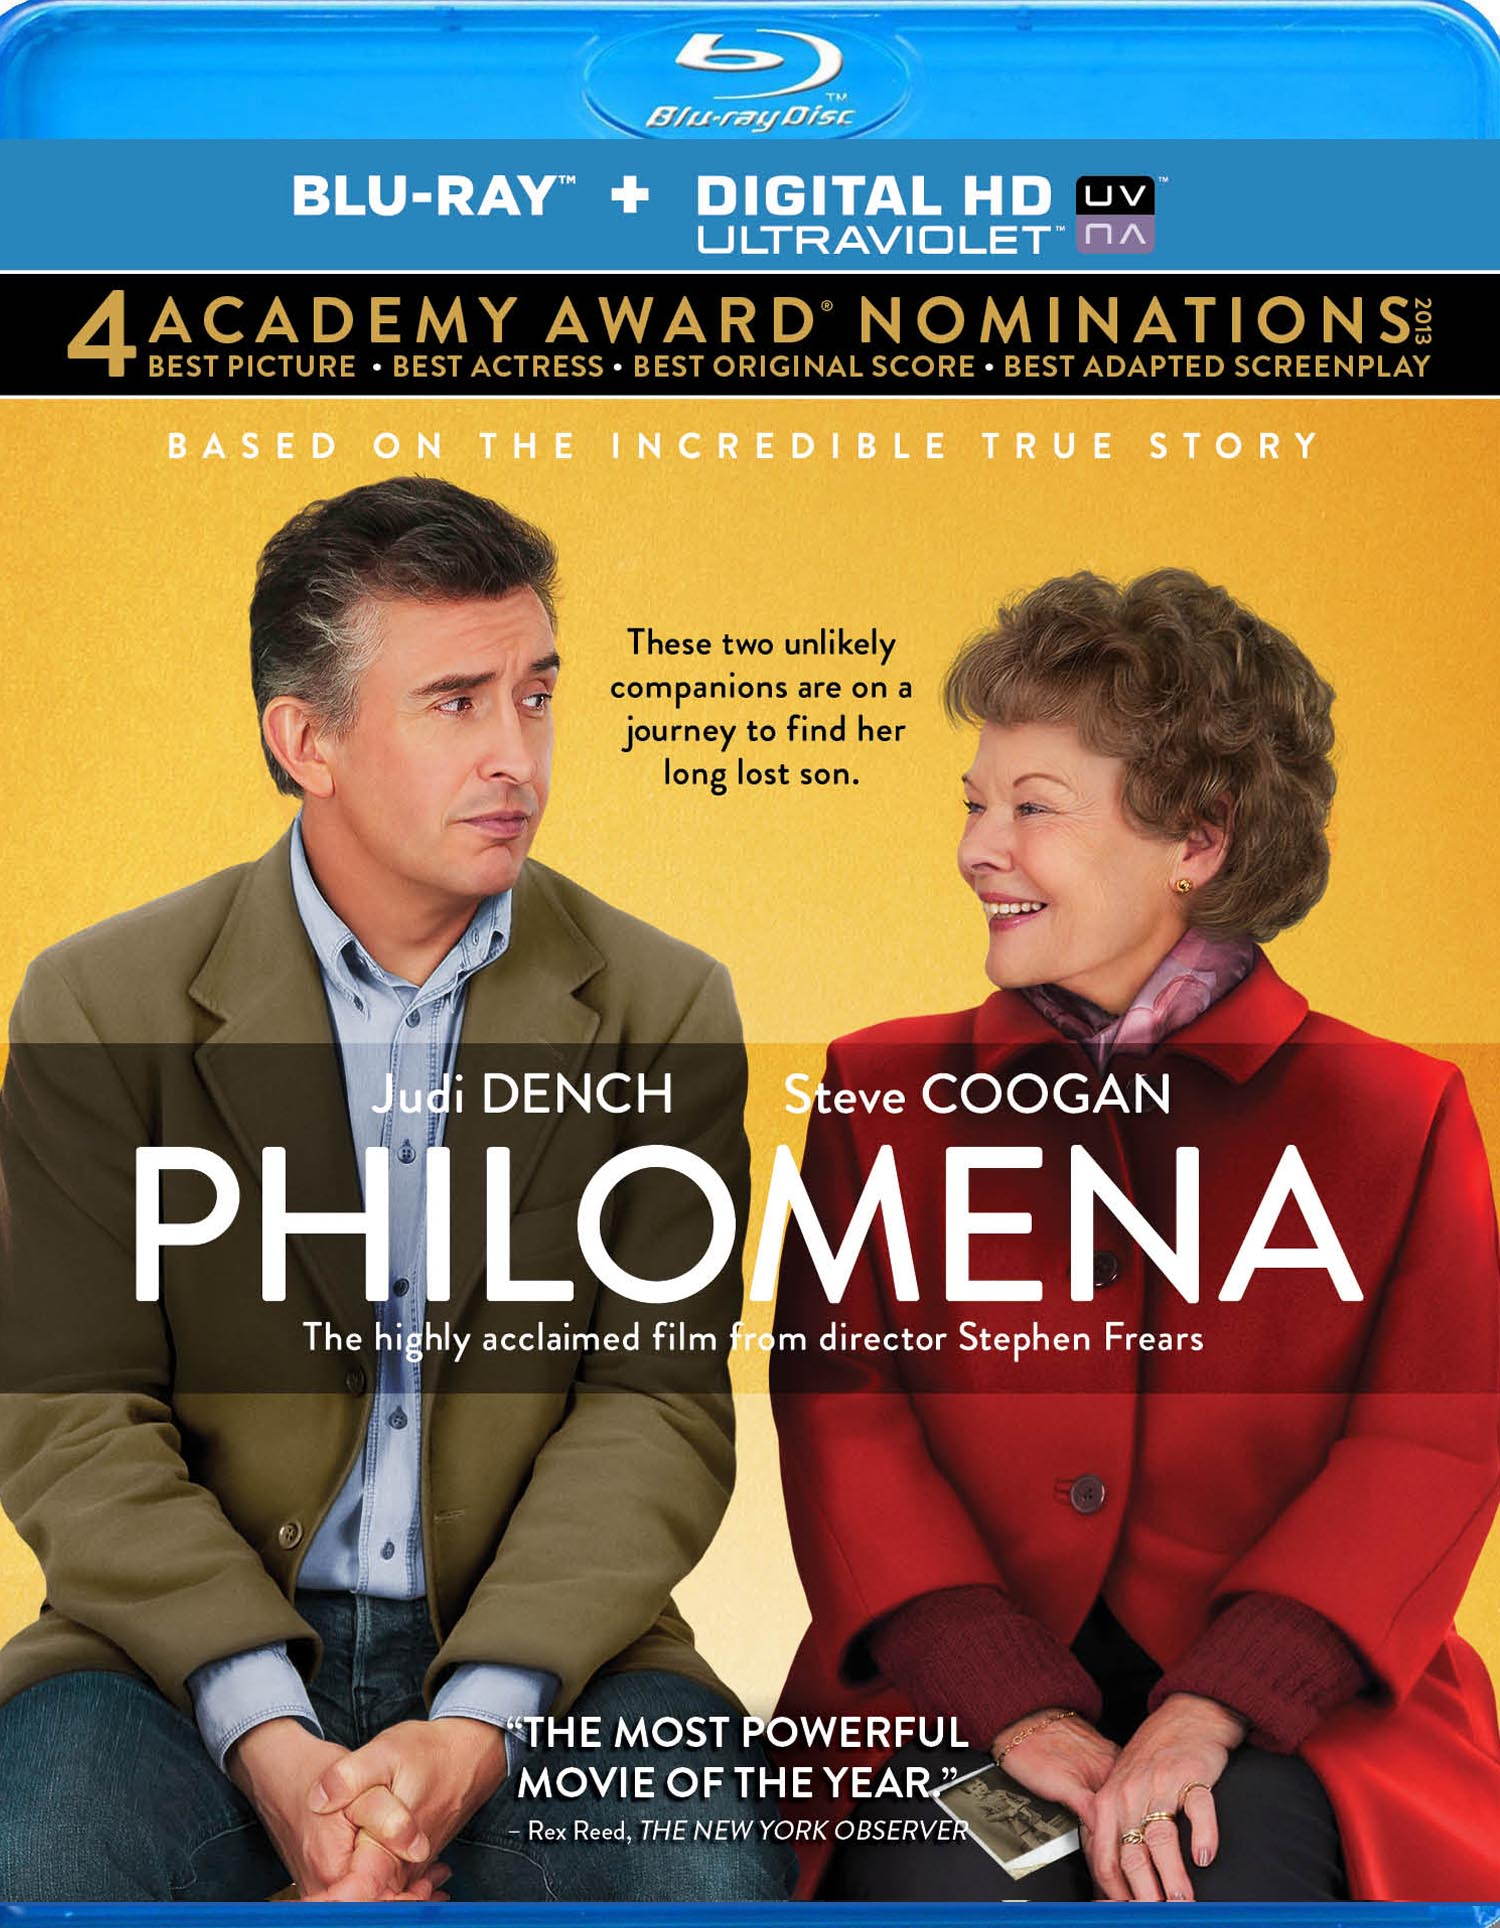 Philomena Blu-ray Review